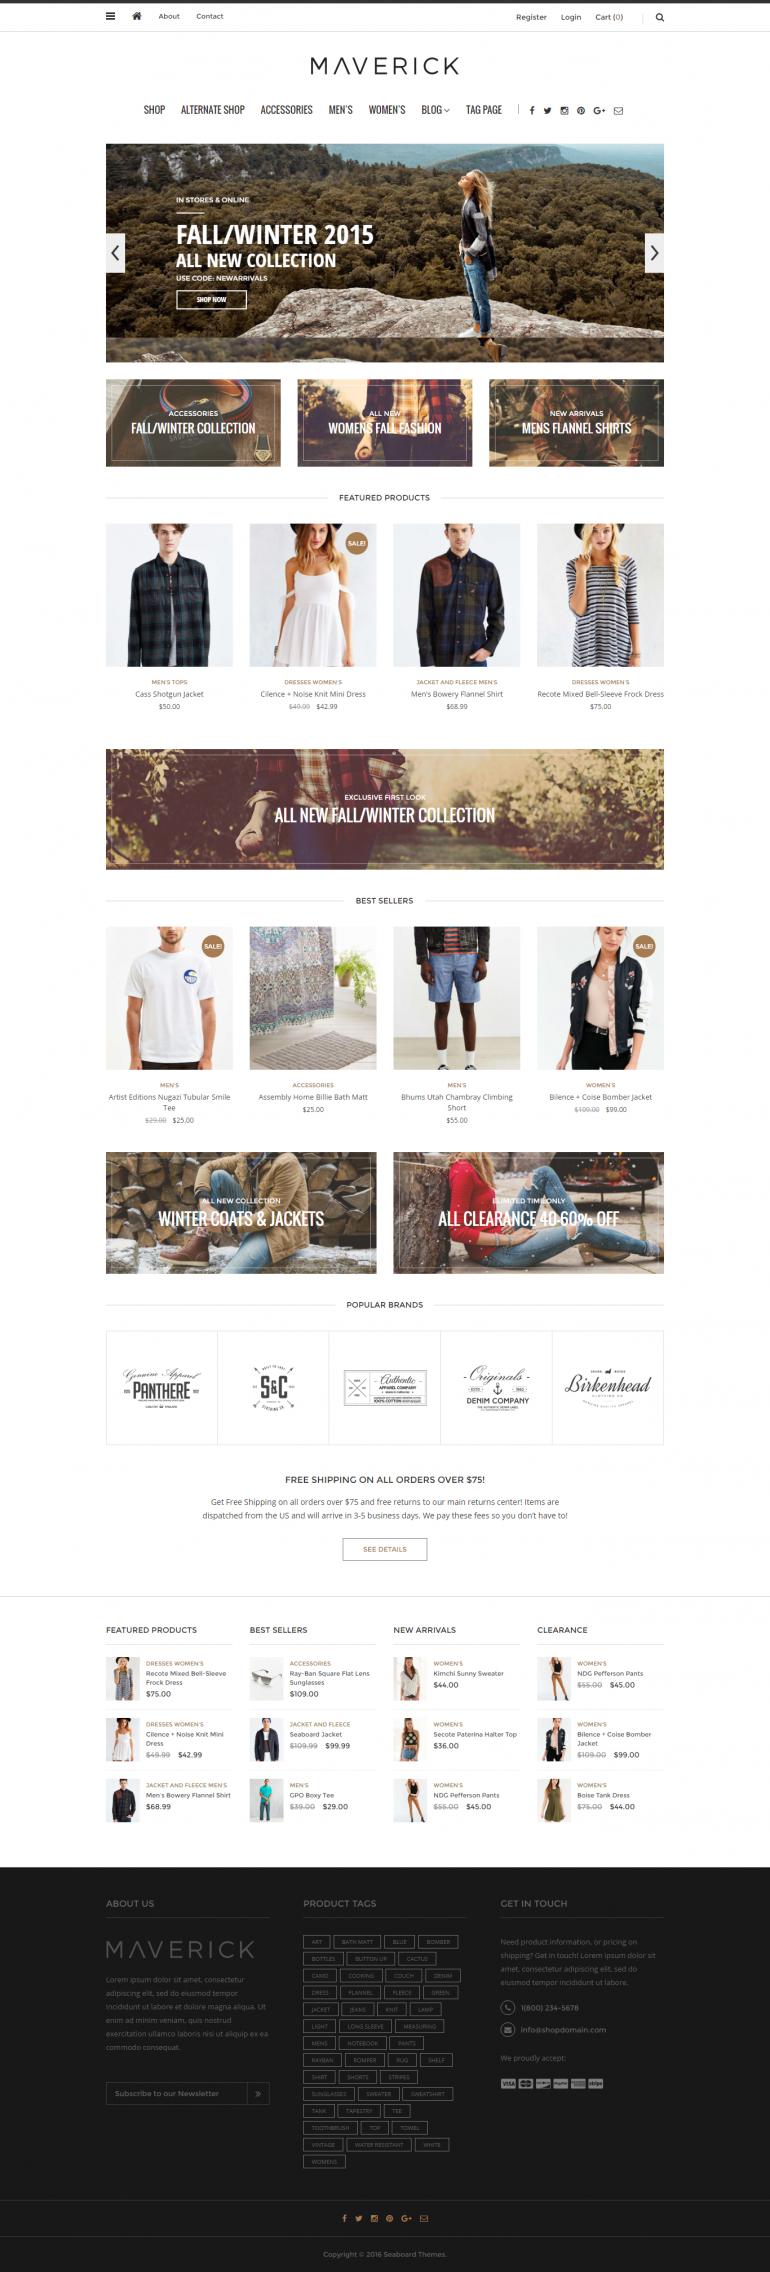 Maverick – Blog, Magazine and Shop